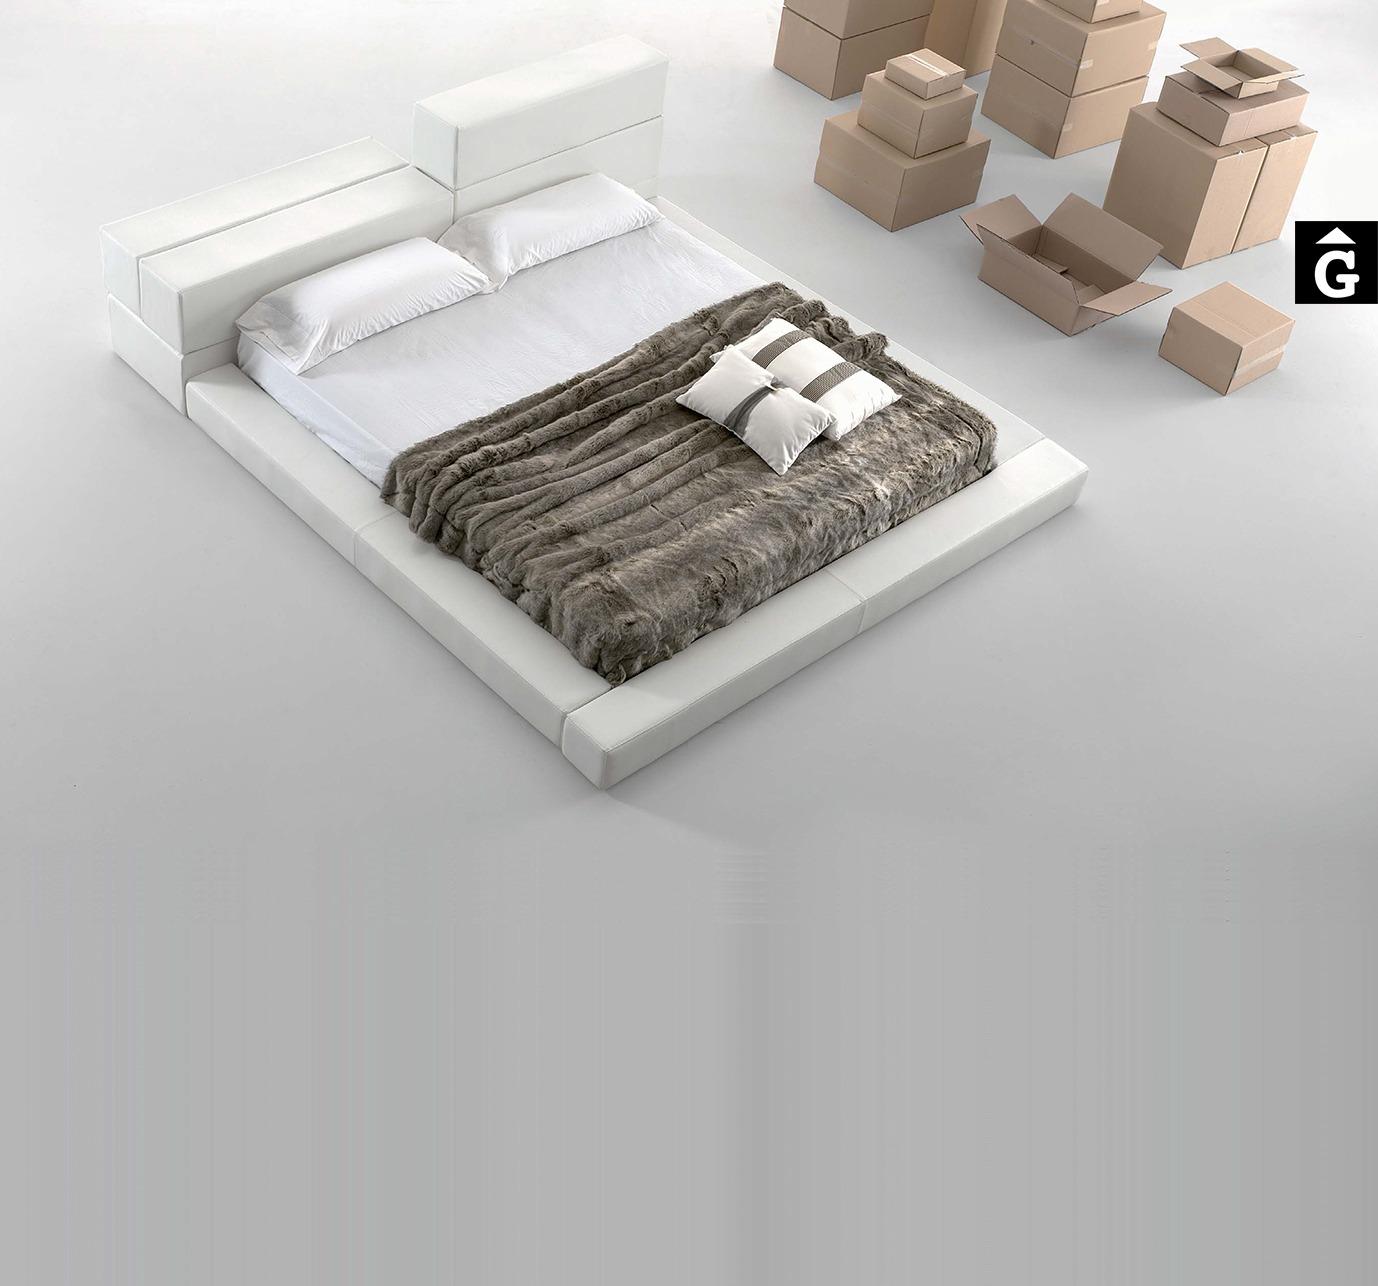 MORADILLO BY MOBLES GIFREU BEDS LLIT TAPISSAT RECTA GIRONA